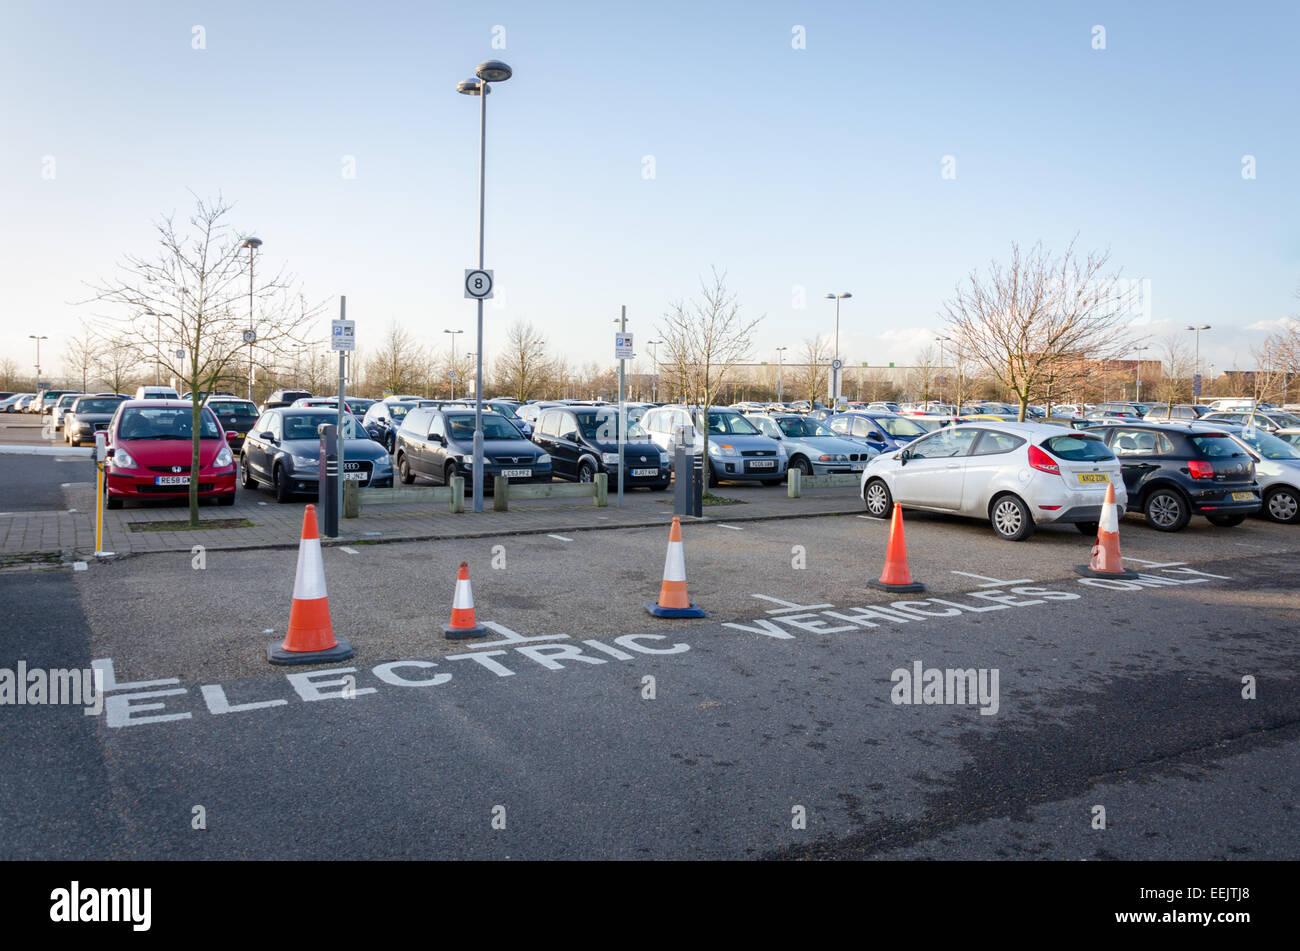 Electric Vehicle (EV) charging point at Trumpington Park & Ride. Cambridge, UK - Stock Image